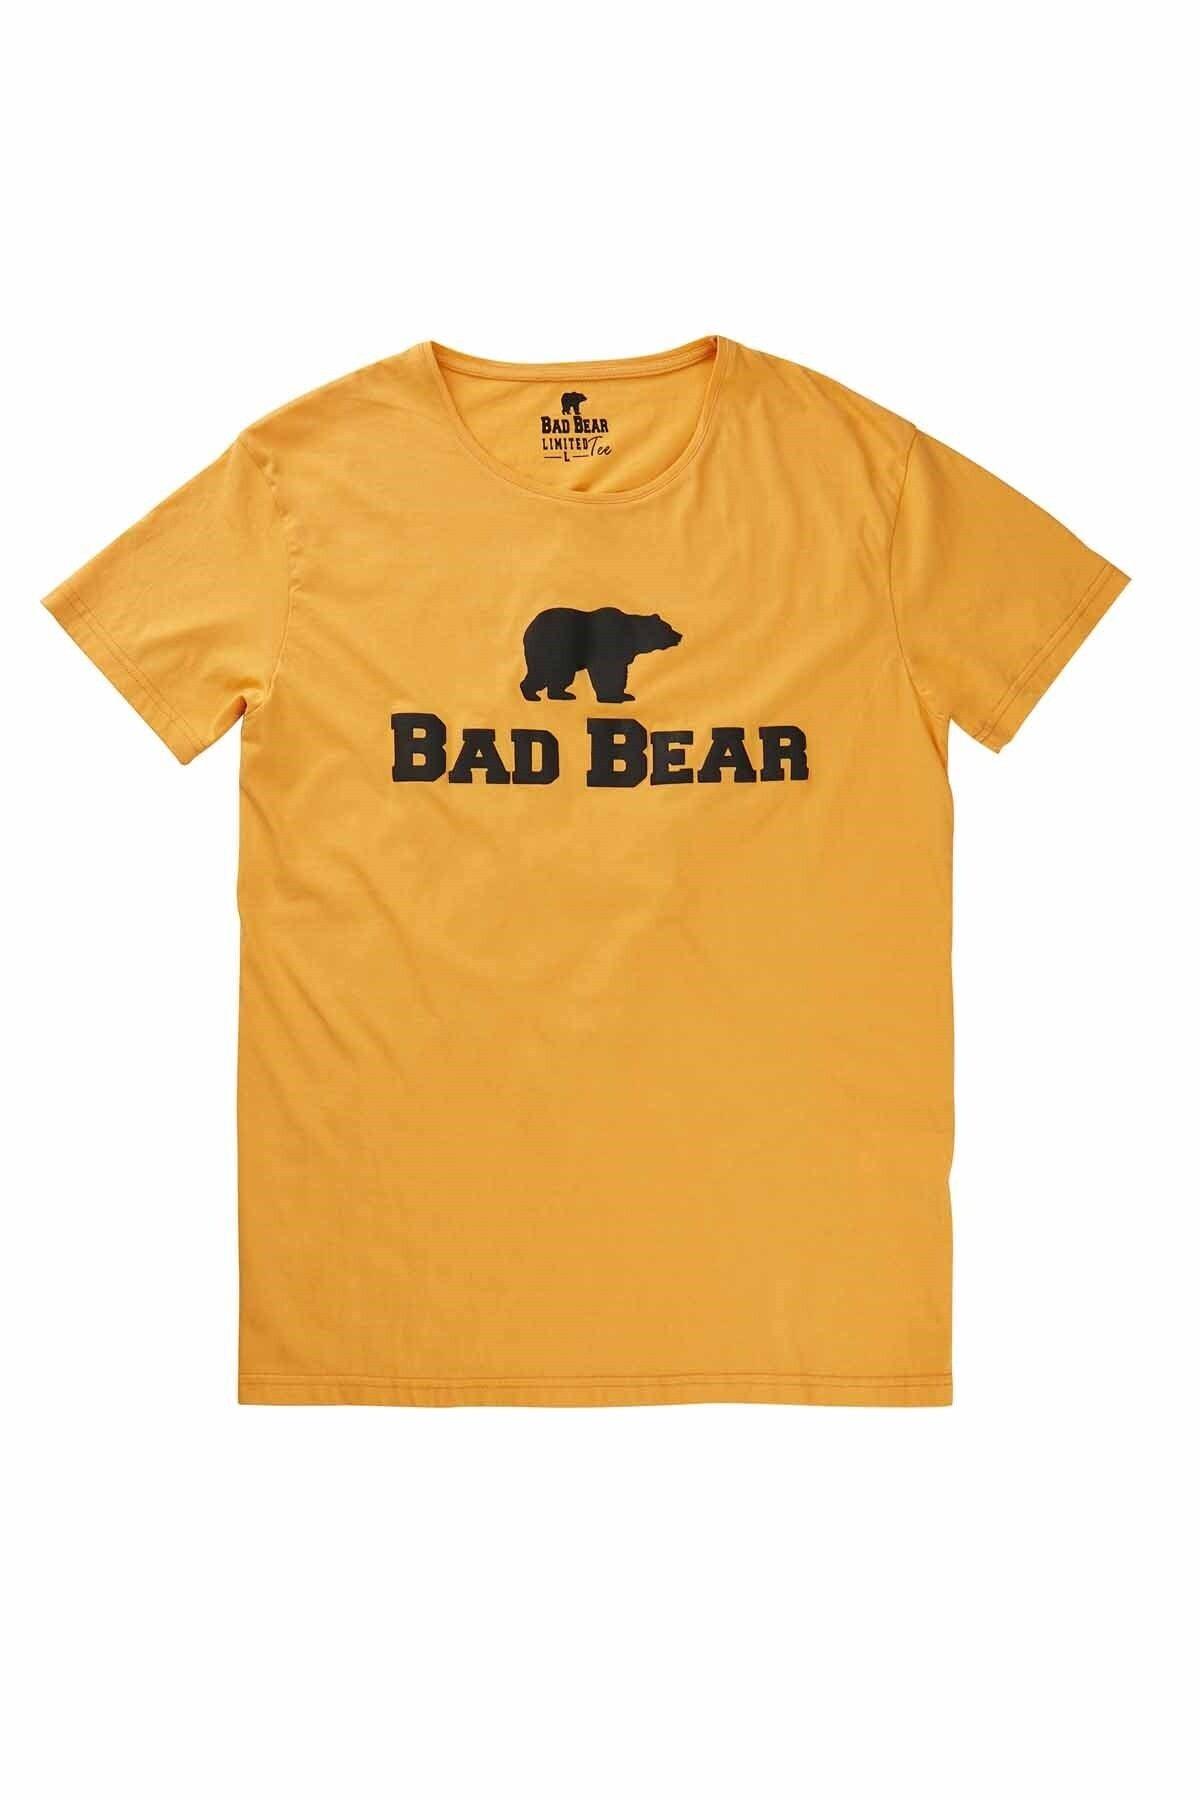 Bad Bear Tee Erkek Tişört 19.01.07.002mustard 2